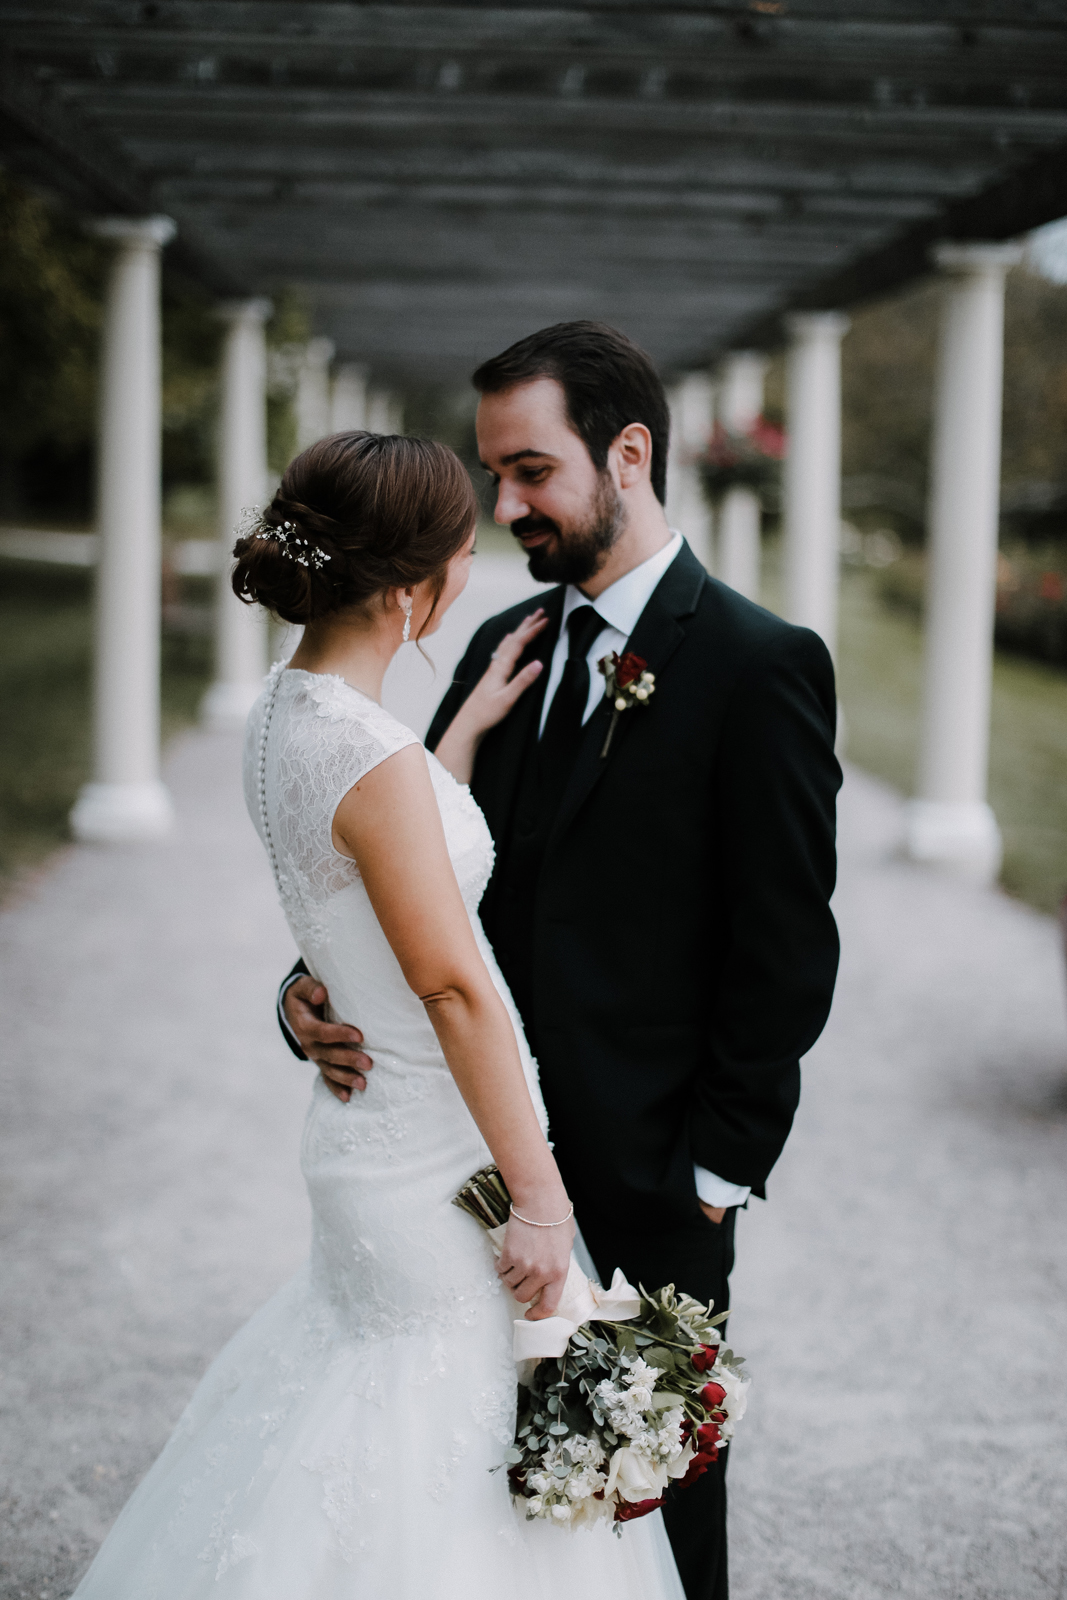 erin-and-alex-wedding-day-542.jpg